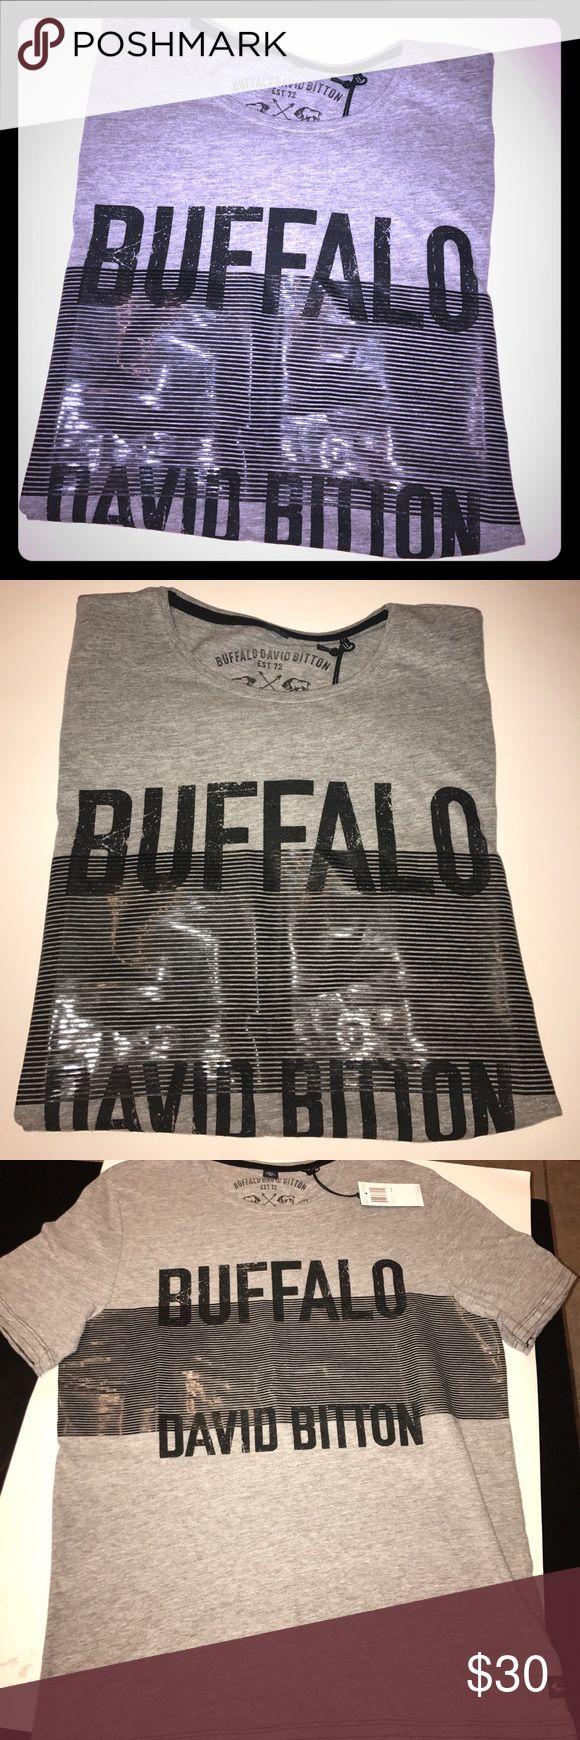 Men's Buffalo David Bitton Tshirt New with tags, size medium, 80% cotton 12% spandex Buffalo David Bitton Shirts Tees - Short Sleeve